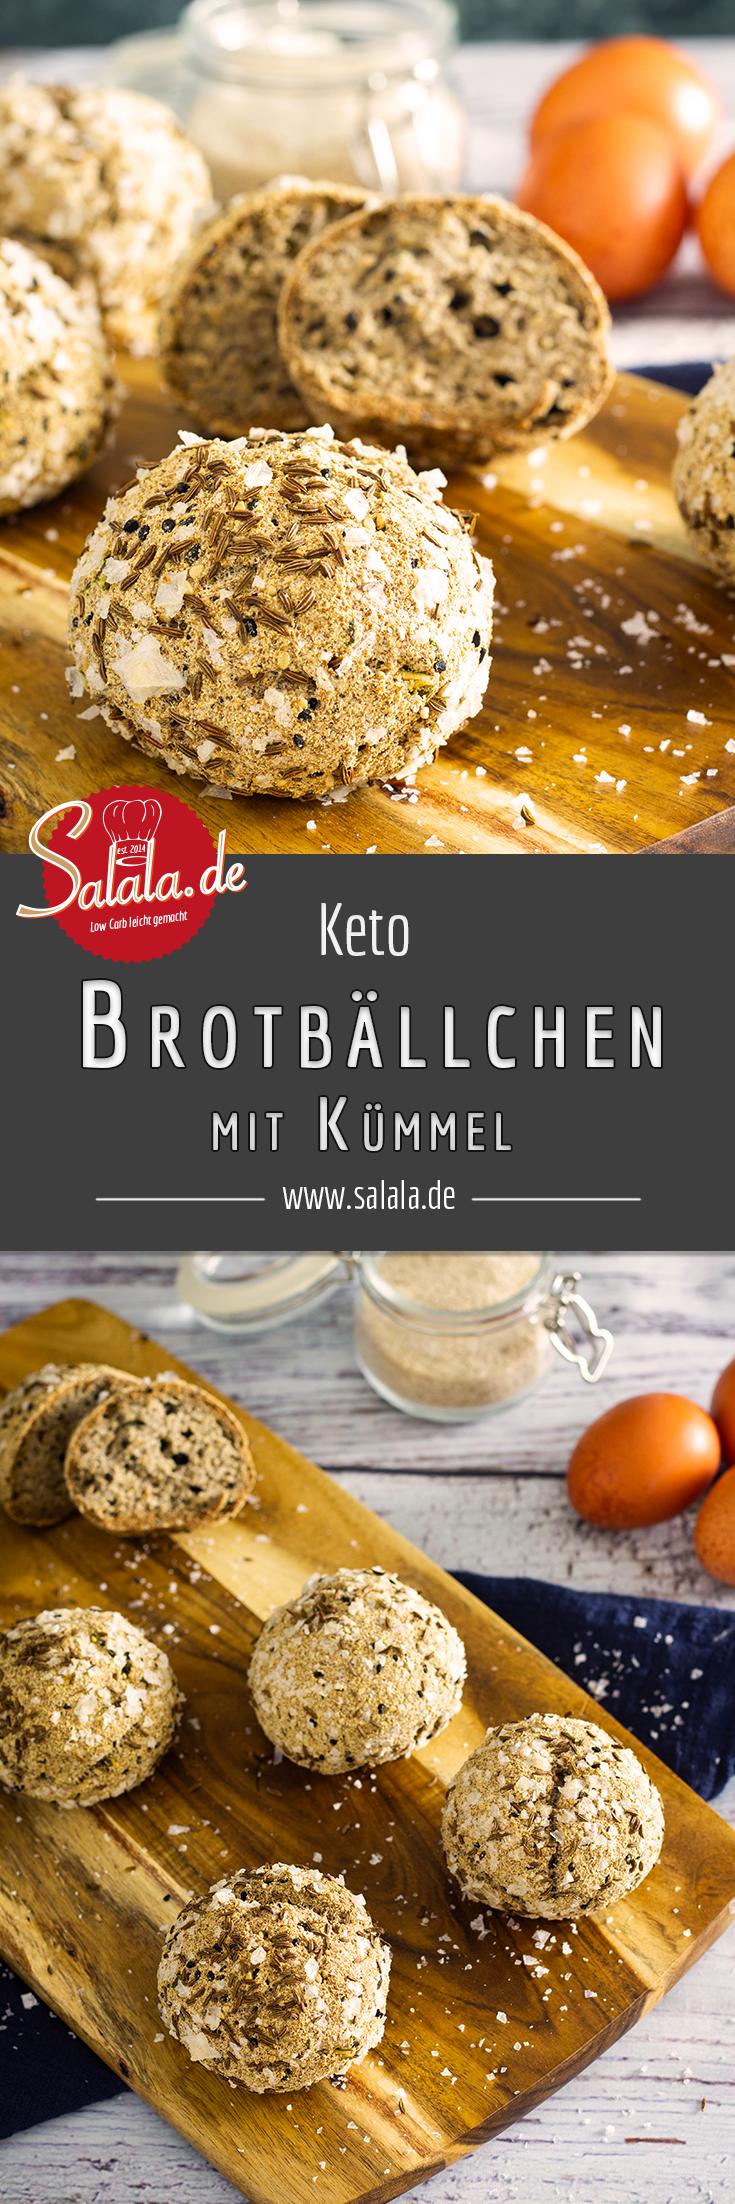 Würzige Keto-Brotbällchen   salala.de – Low Carb leicht gemacht